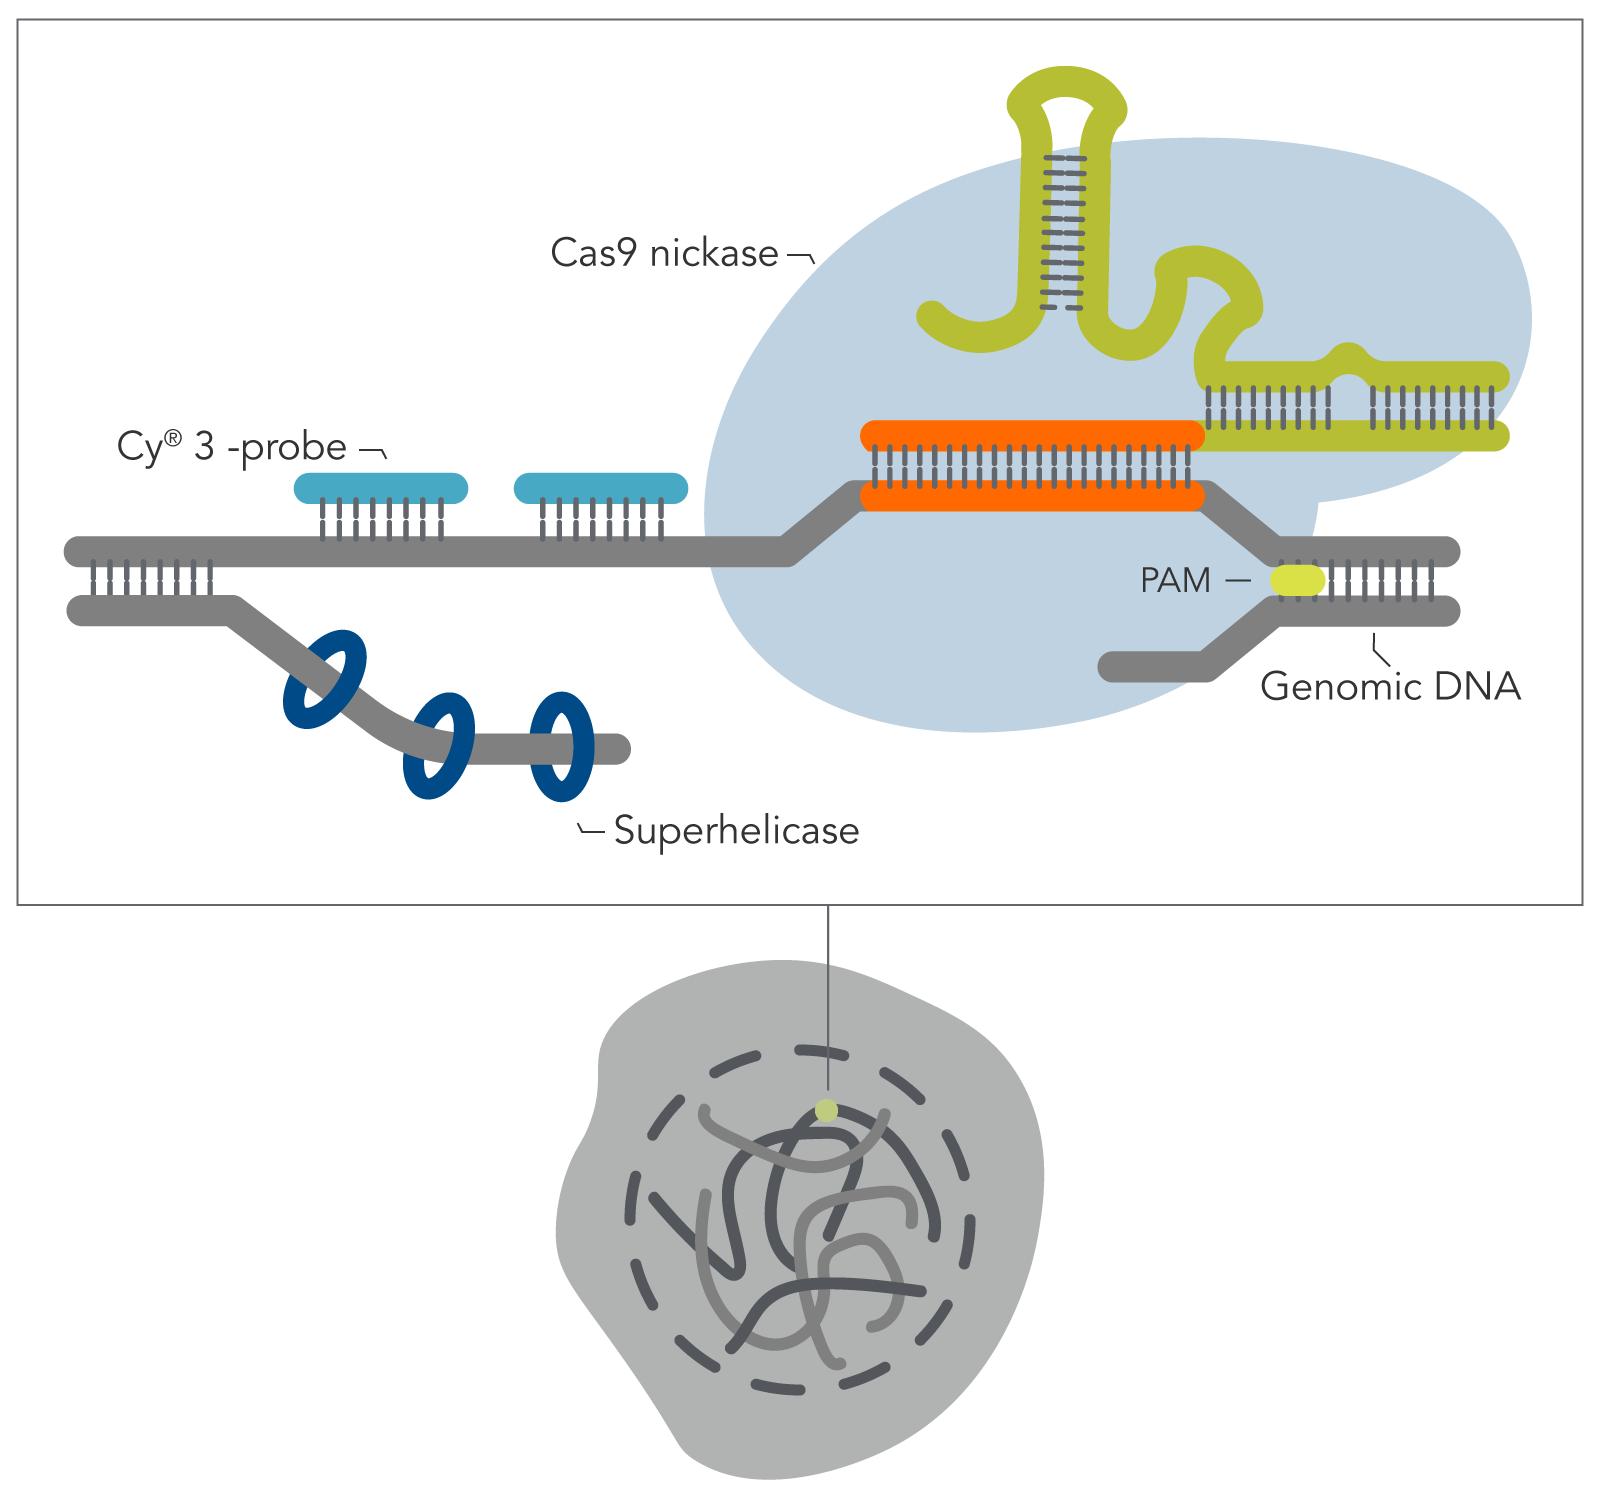 21_GE_FIG_DECODED_Genomic-Oligopaint-with-oPools_F